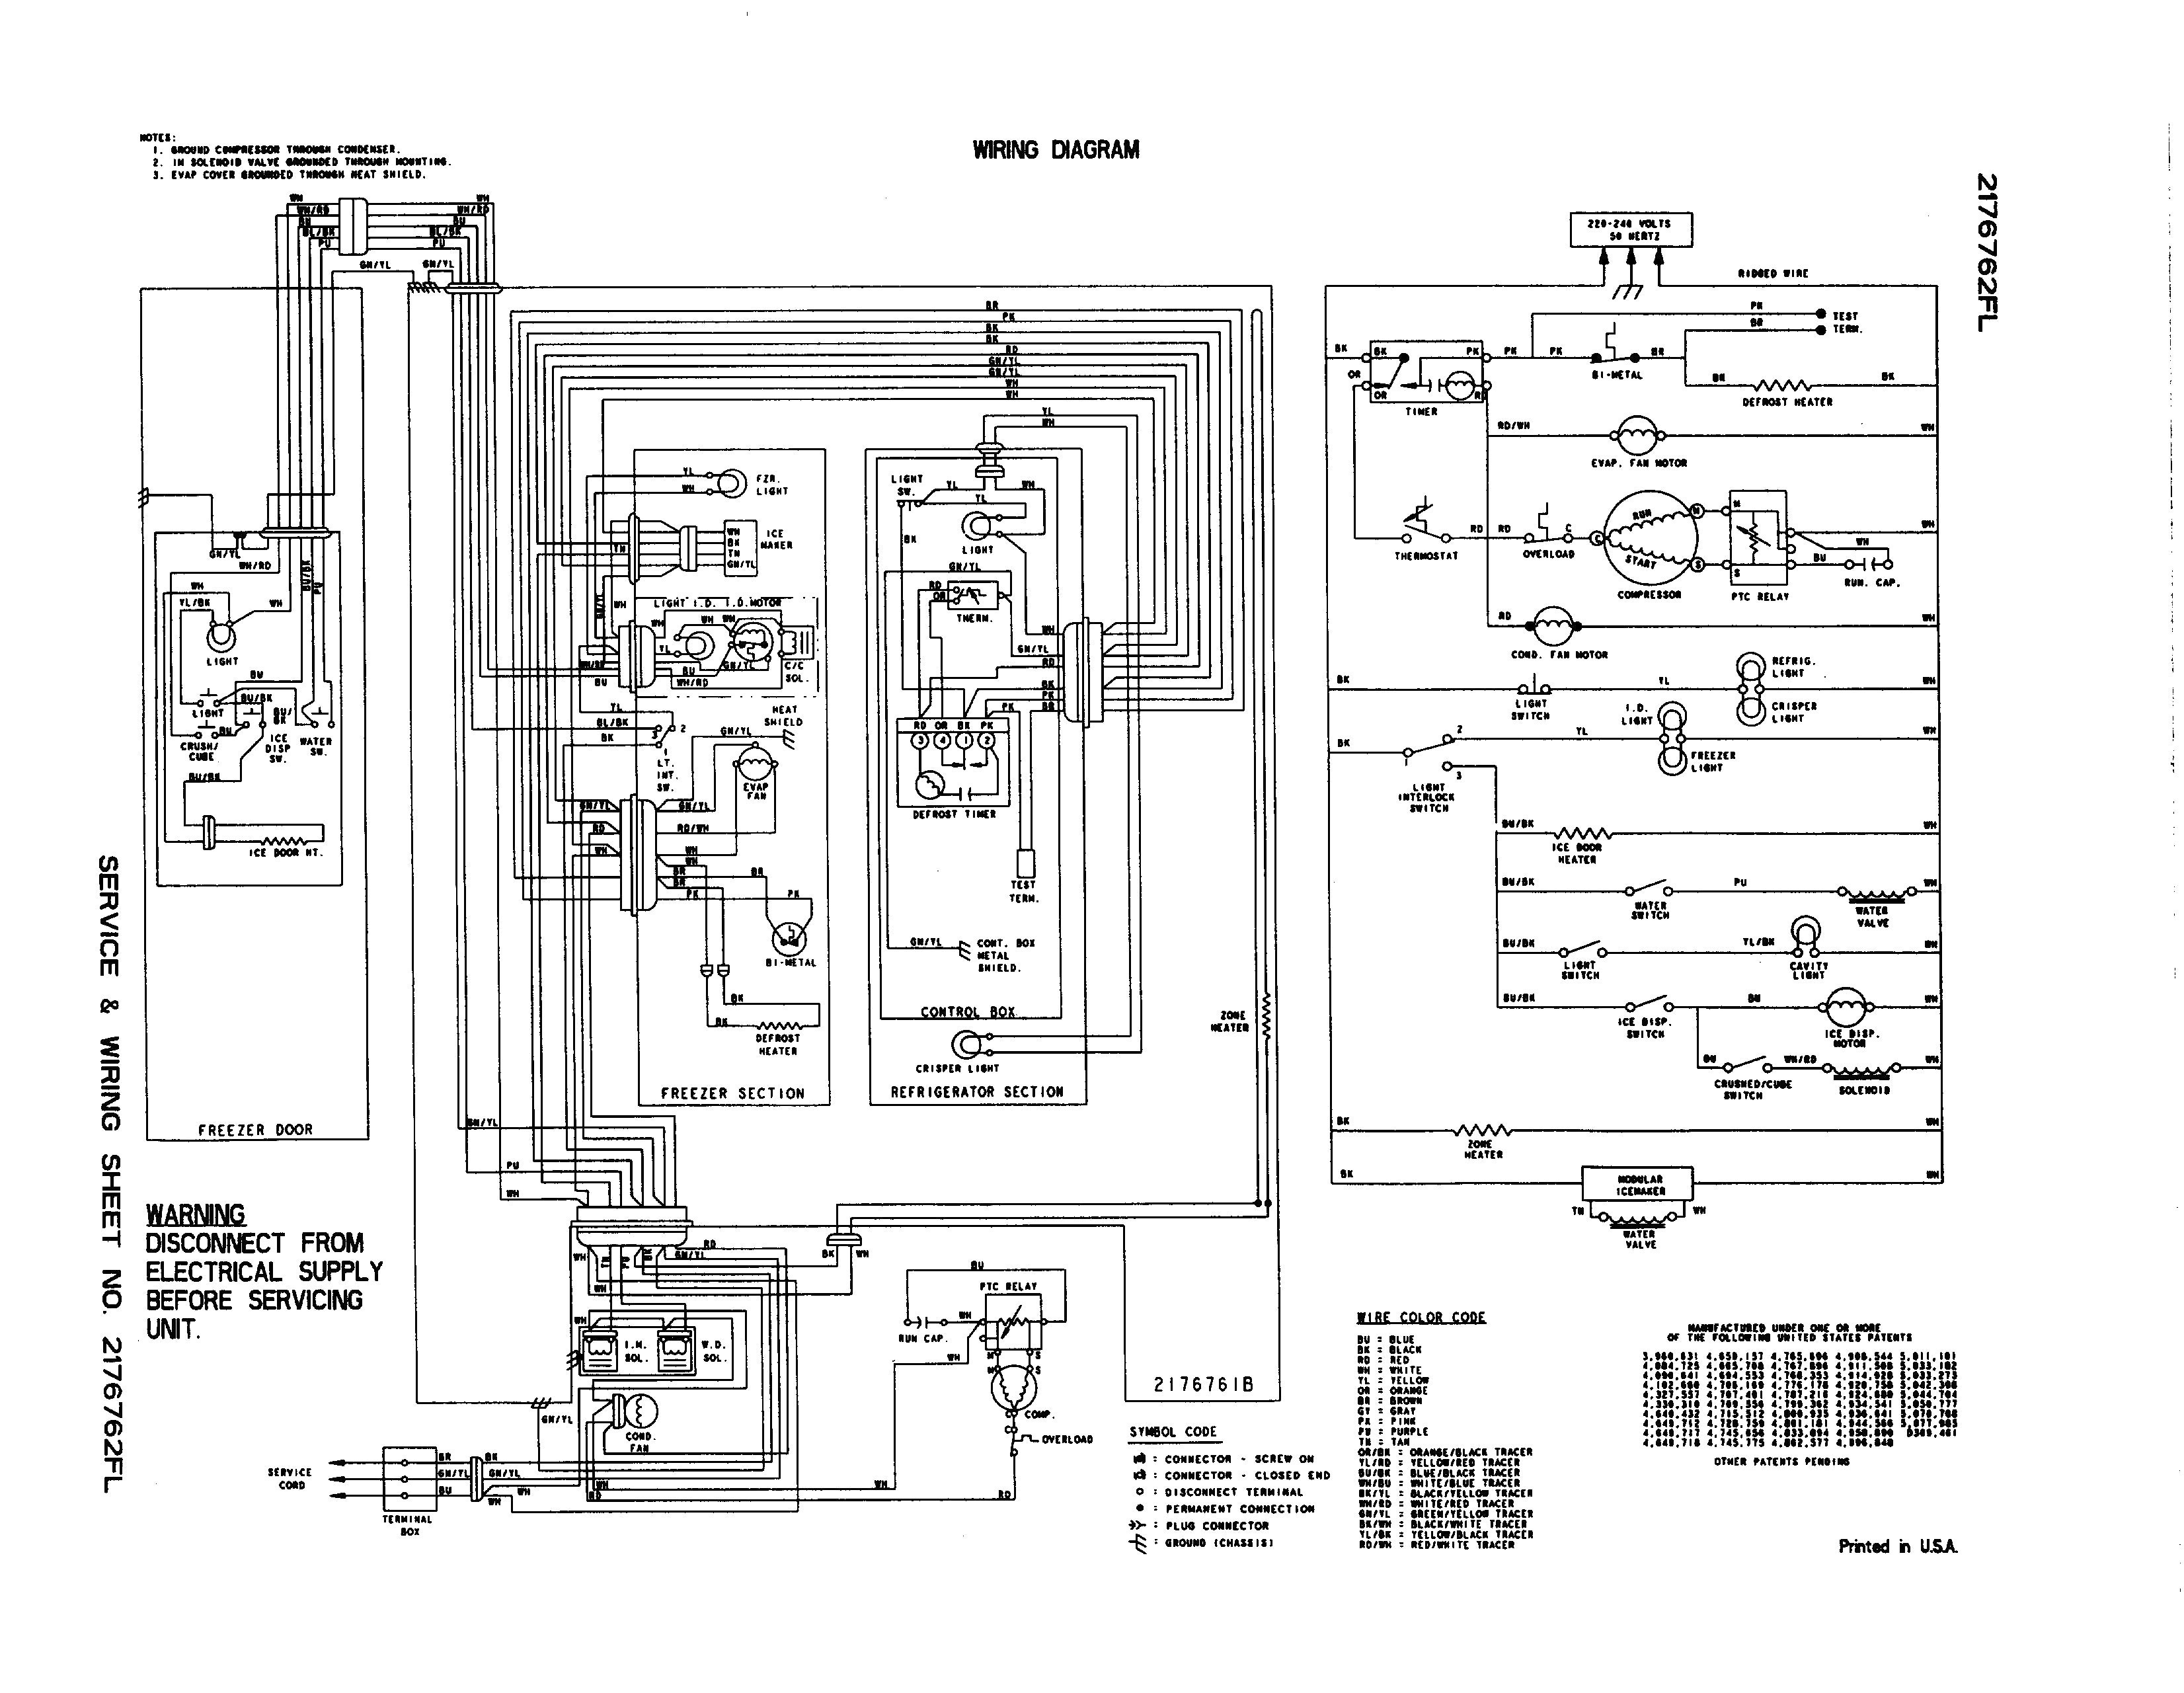 Inverter Refrigerator Wiring Diagram New Ge Refrigerator Wiring Diagram Ice Maker Fresh Whirlpool